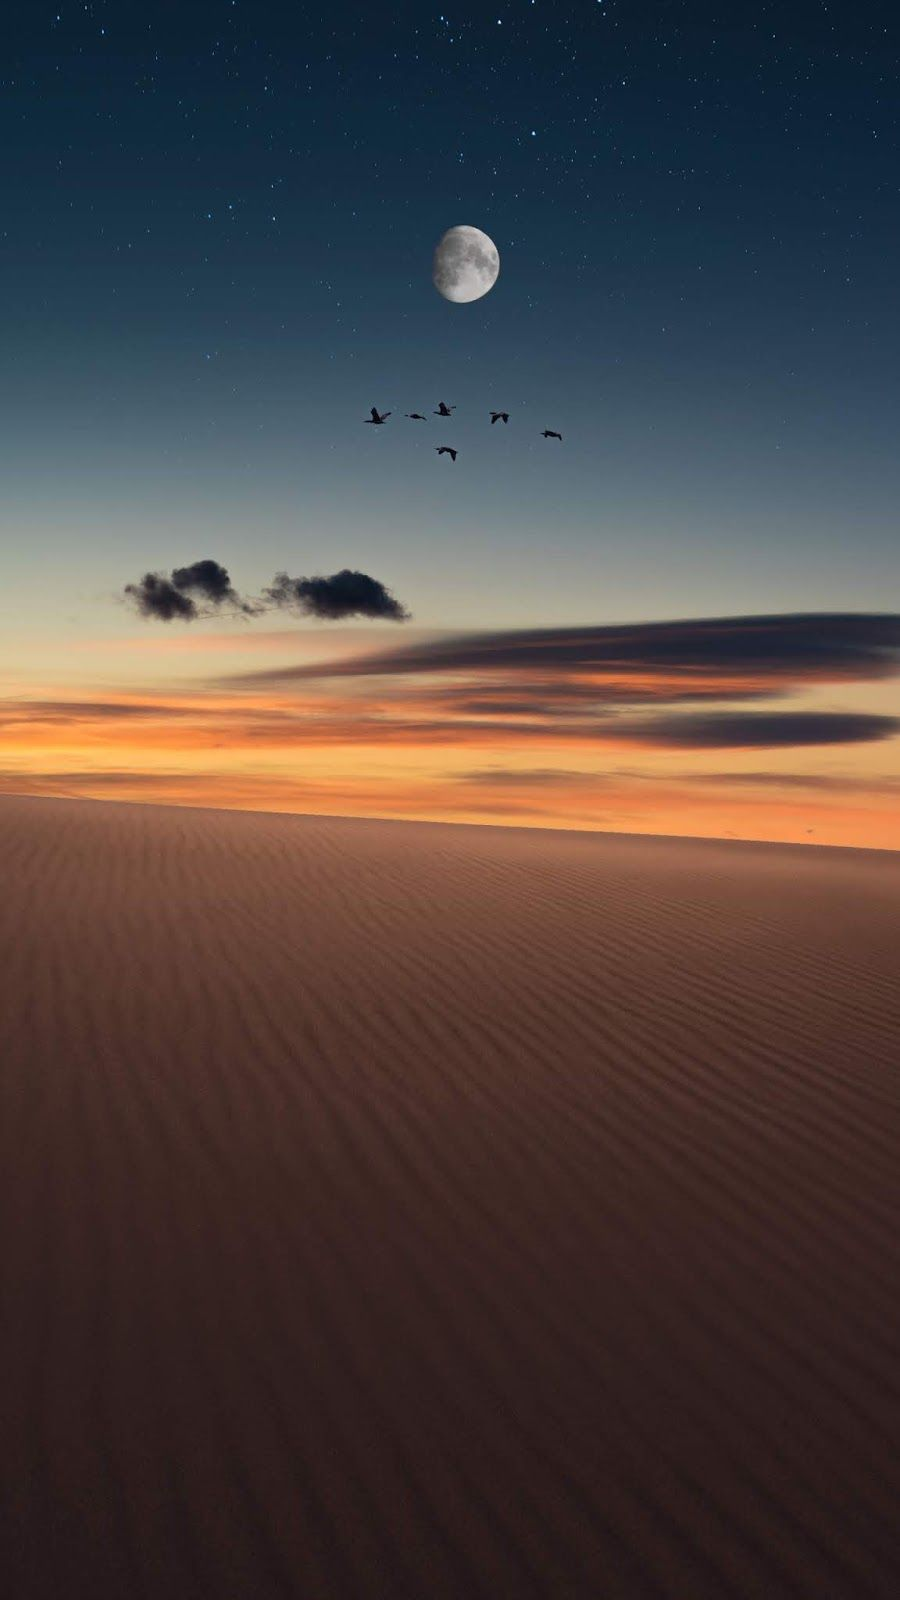 Desert Night Sky Sunset Iphone Wallpaper Iphone Wallpaper Sky Sunrise Wallpaper